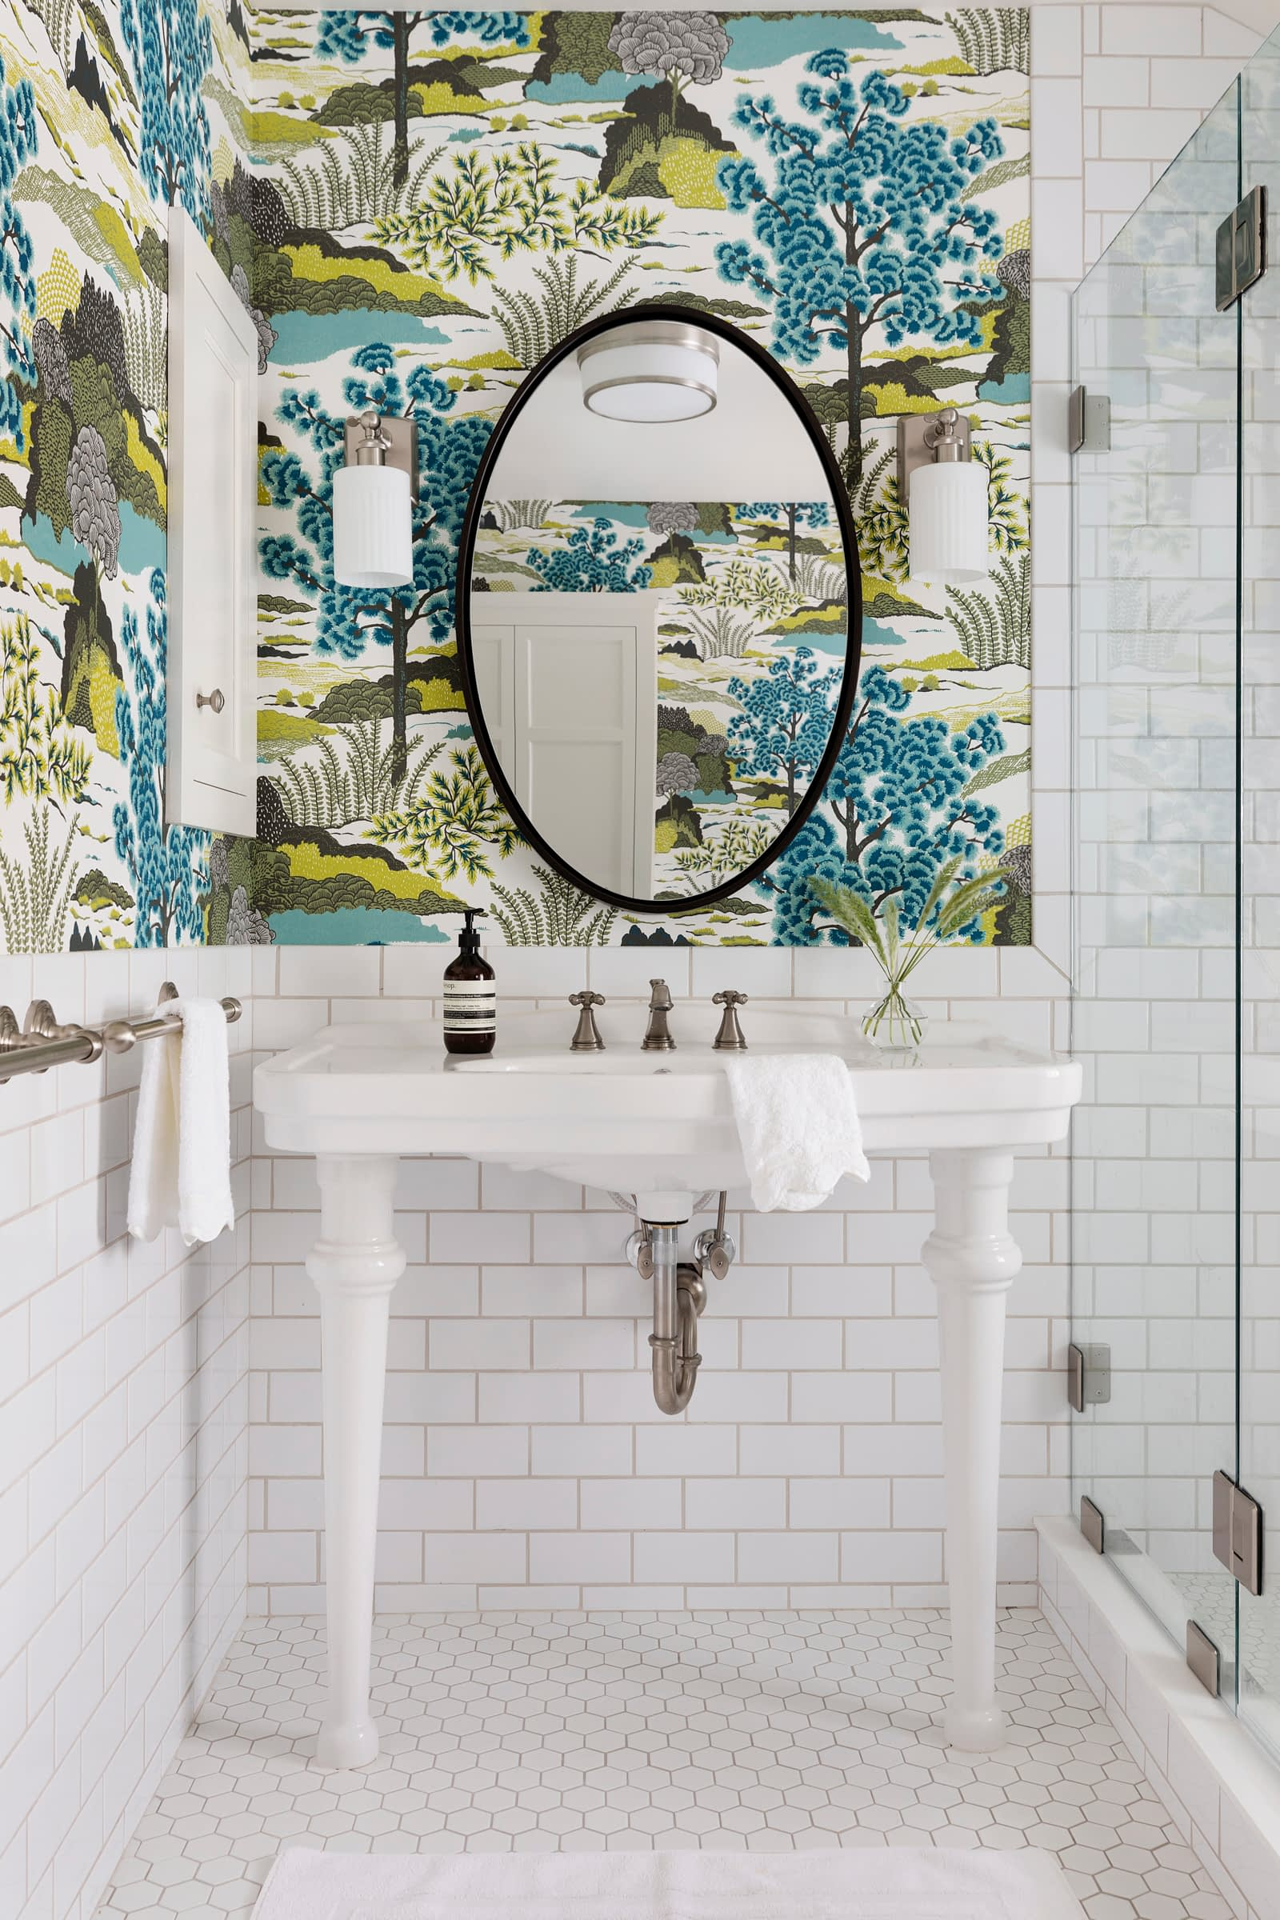 Leigh Hull Designs - Minneapolis Interior Designer - Project: cedar-isles-dean